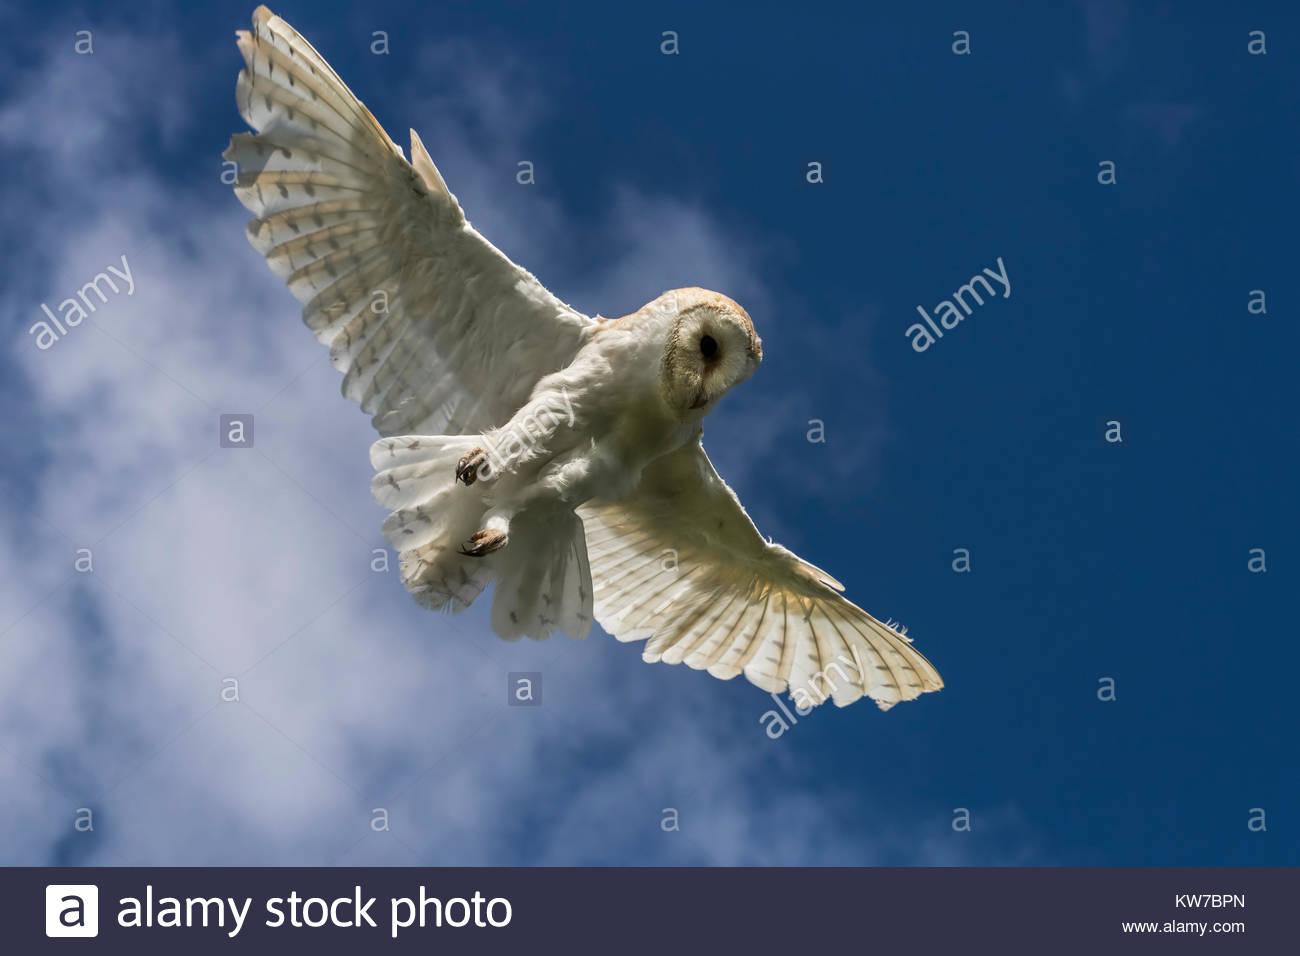 Effraie des clochers (Tyto alba), Cumbria, Royaume-Uni, août 2017 Photo Stock